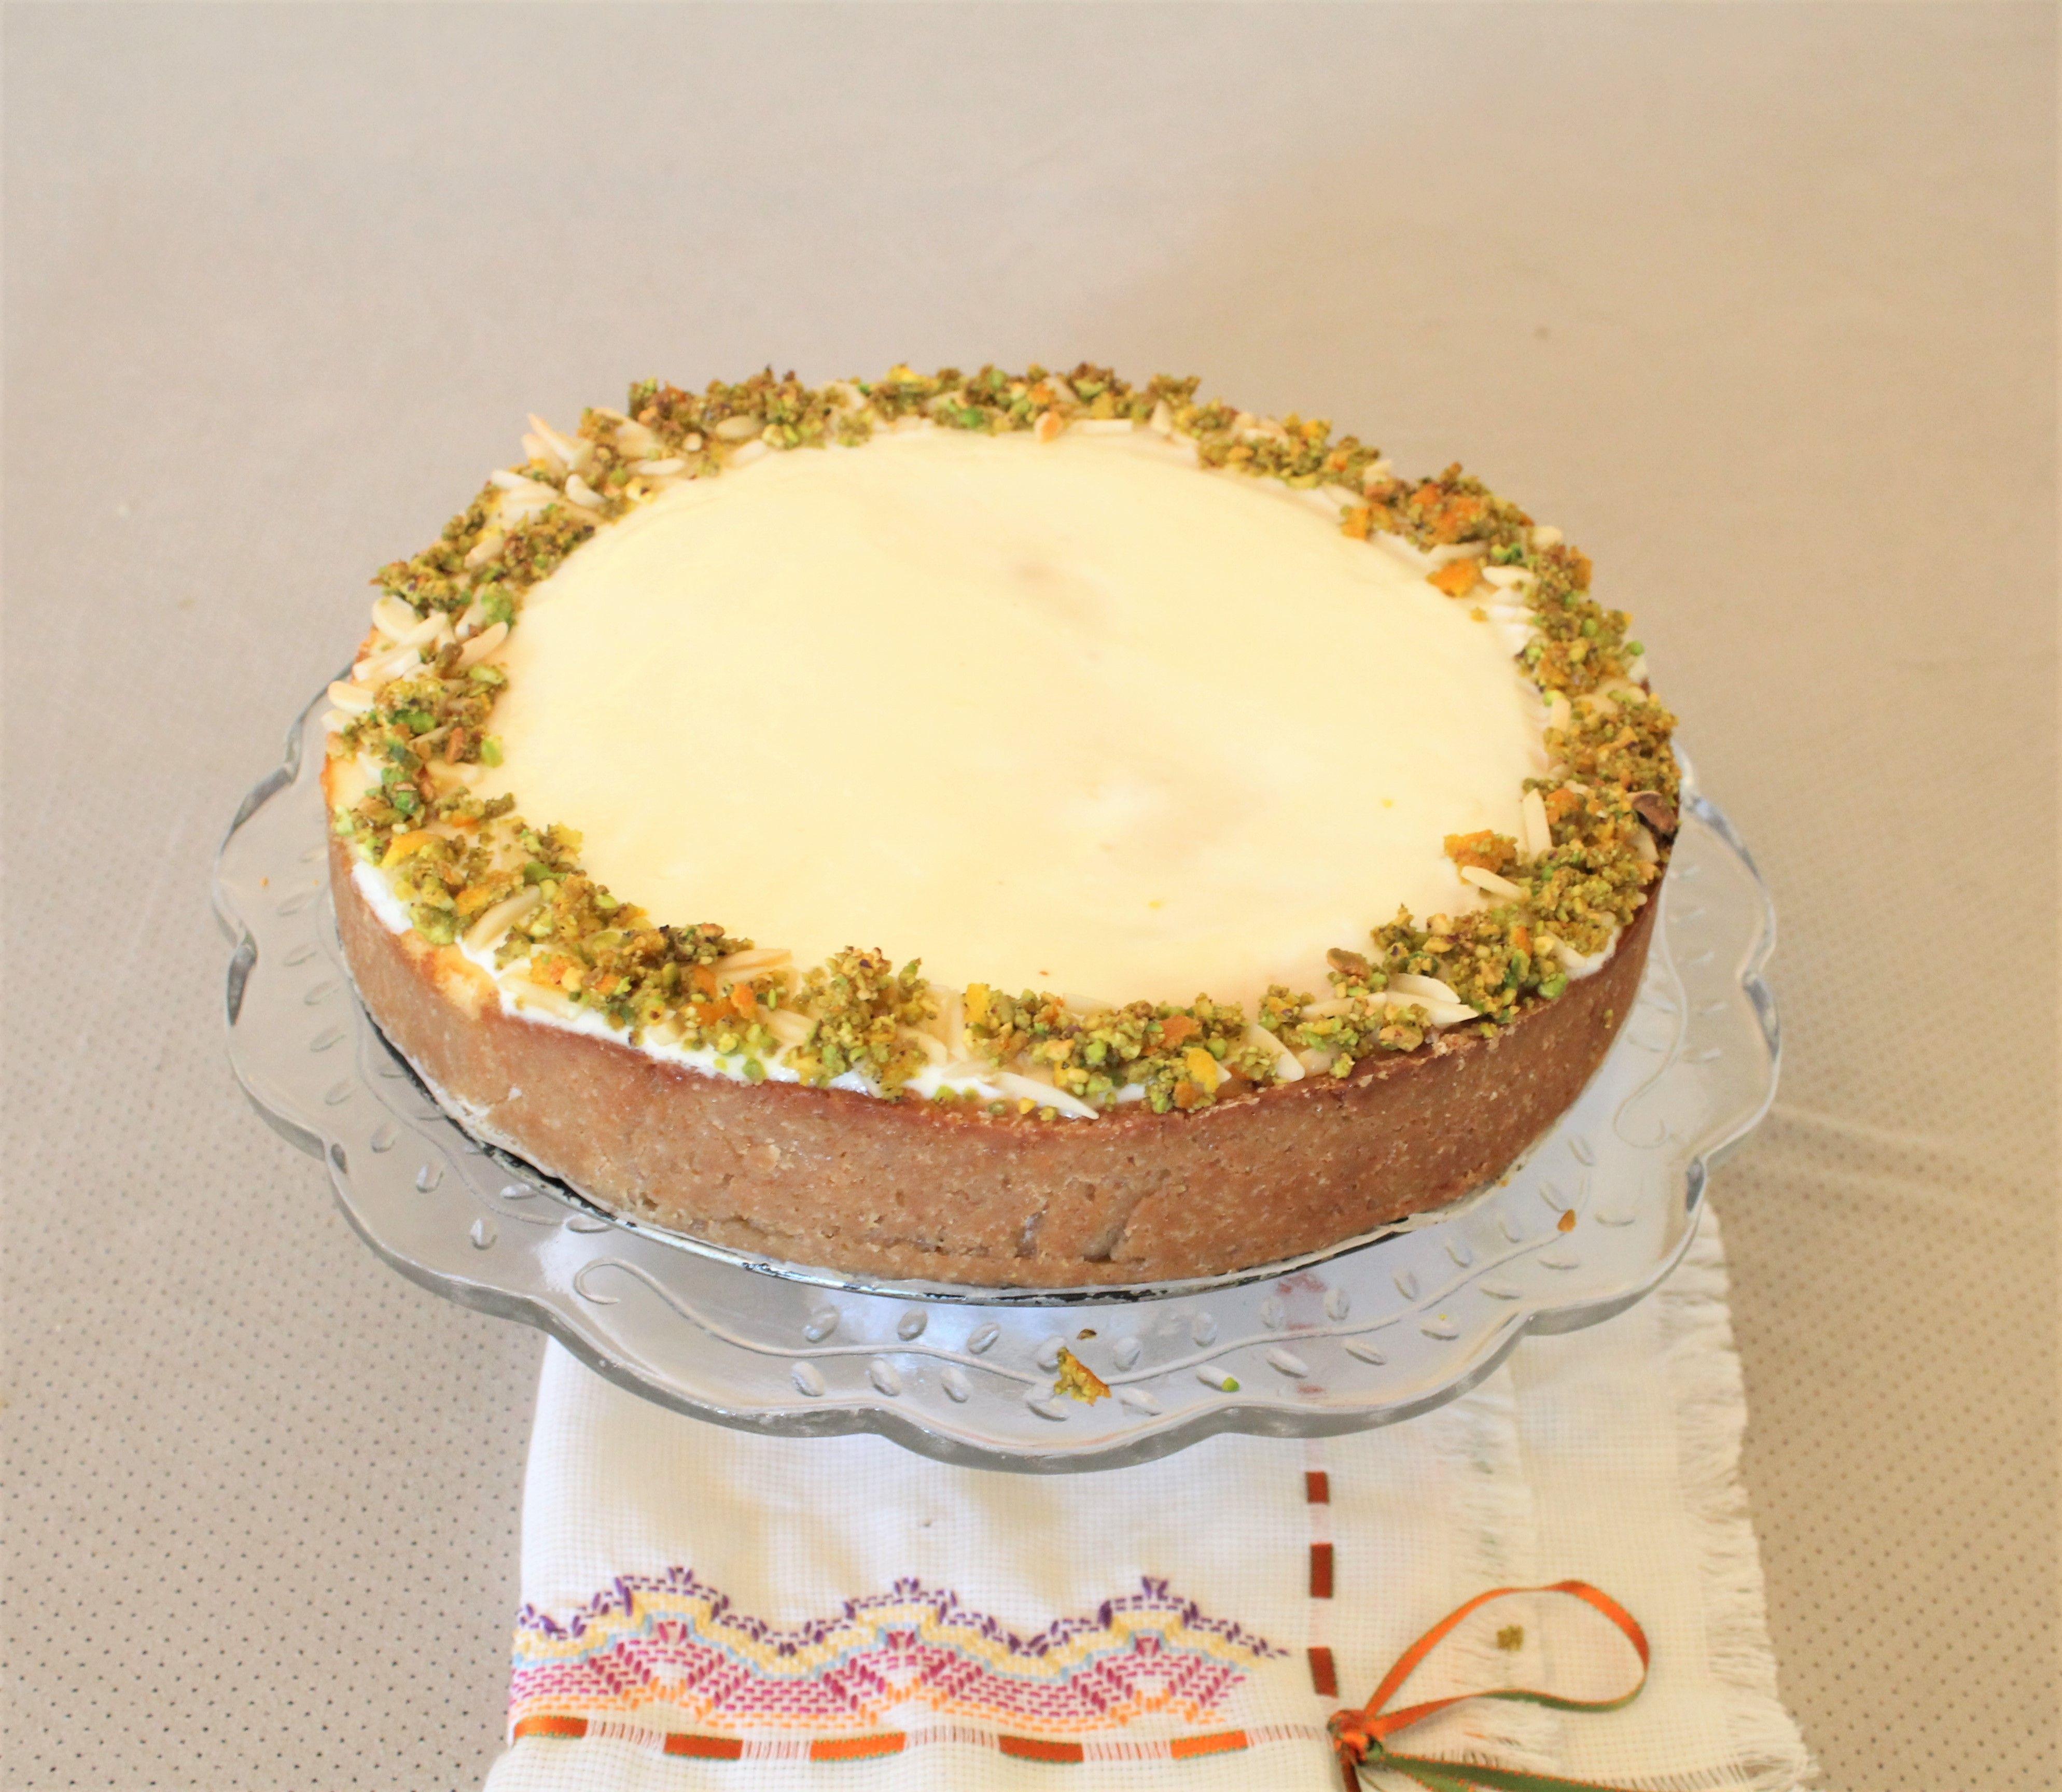 IMG 3775 - עוגת גבינה בניחוח פרות הדר